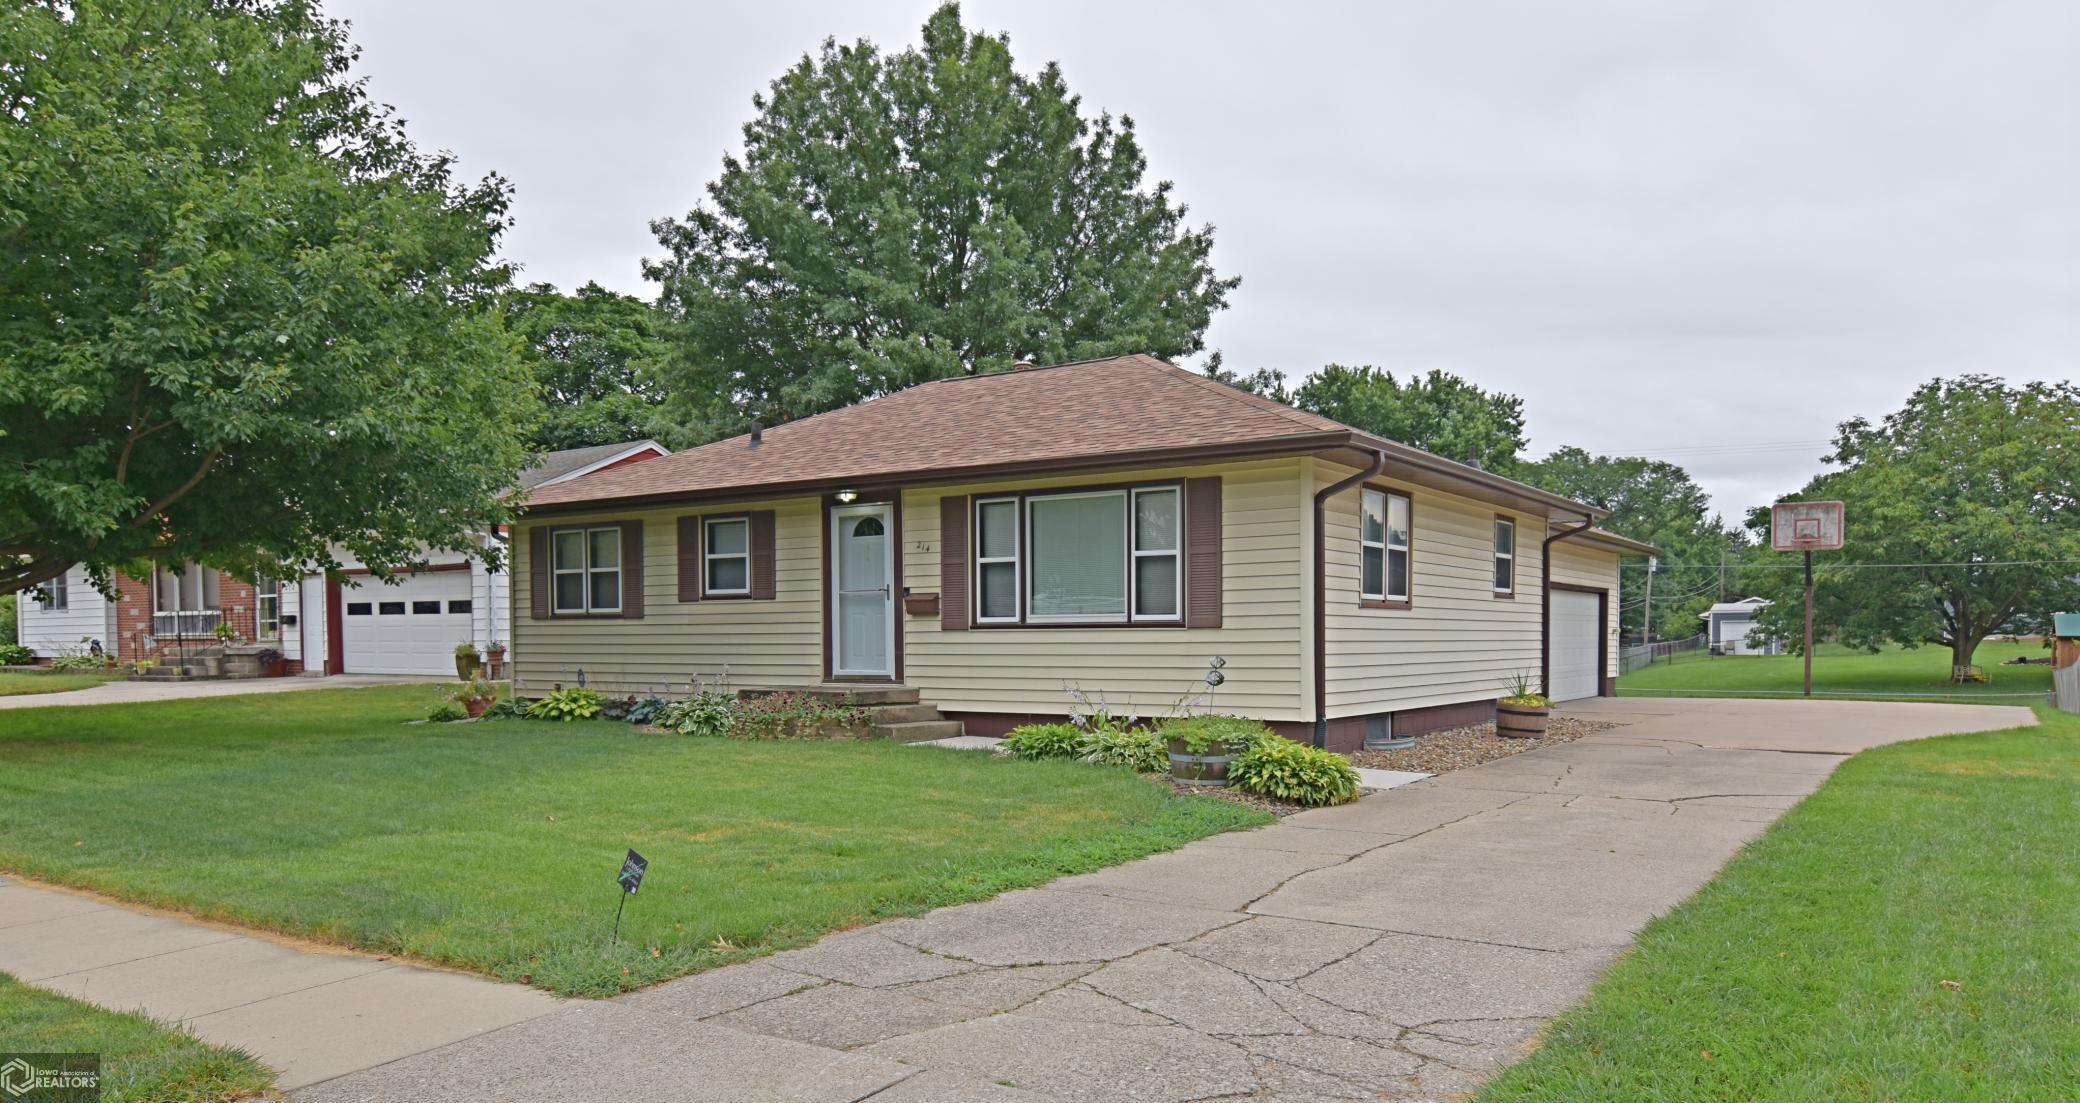 214 Meadow Property Photo - Marshalltown, IA real estate listing